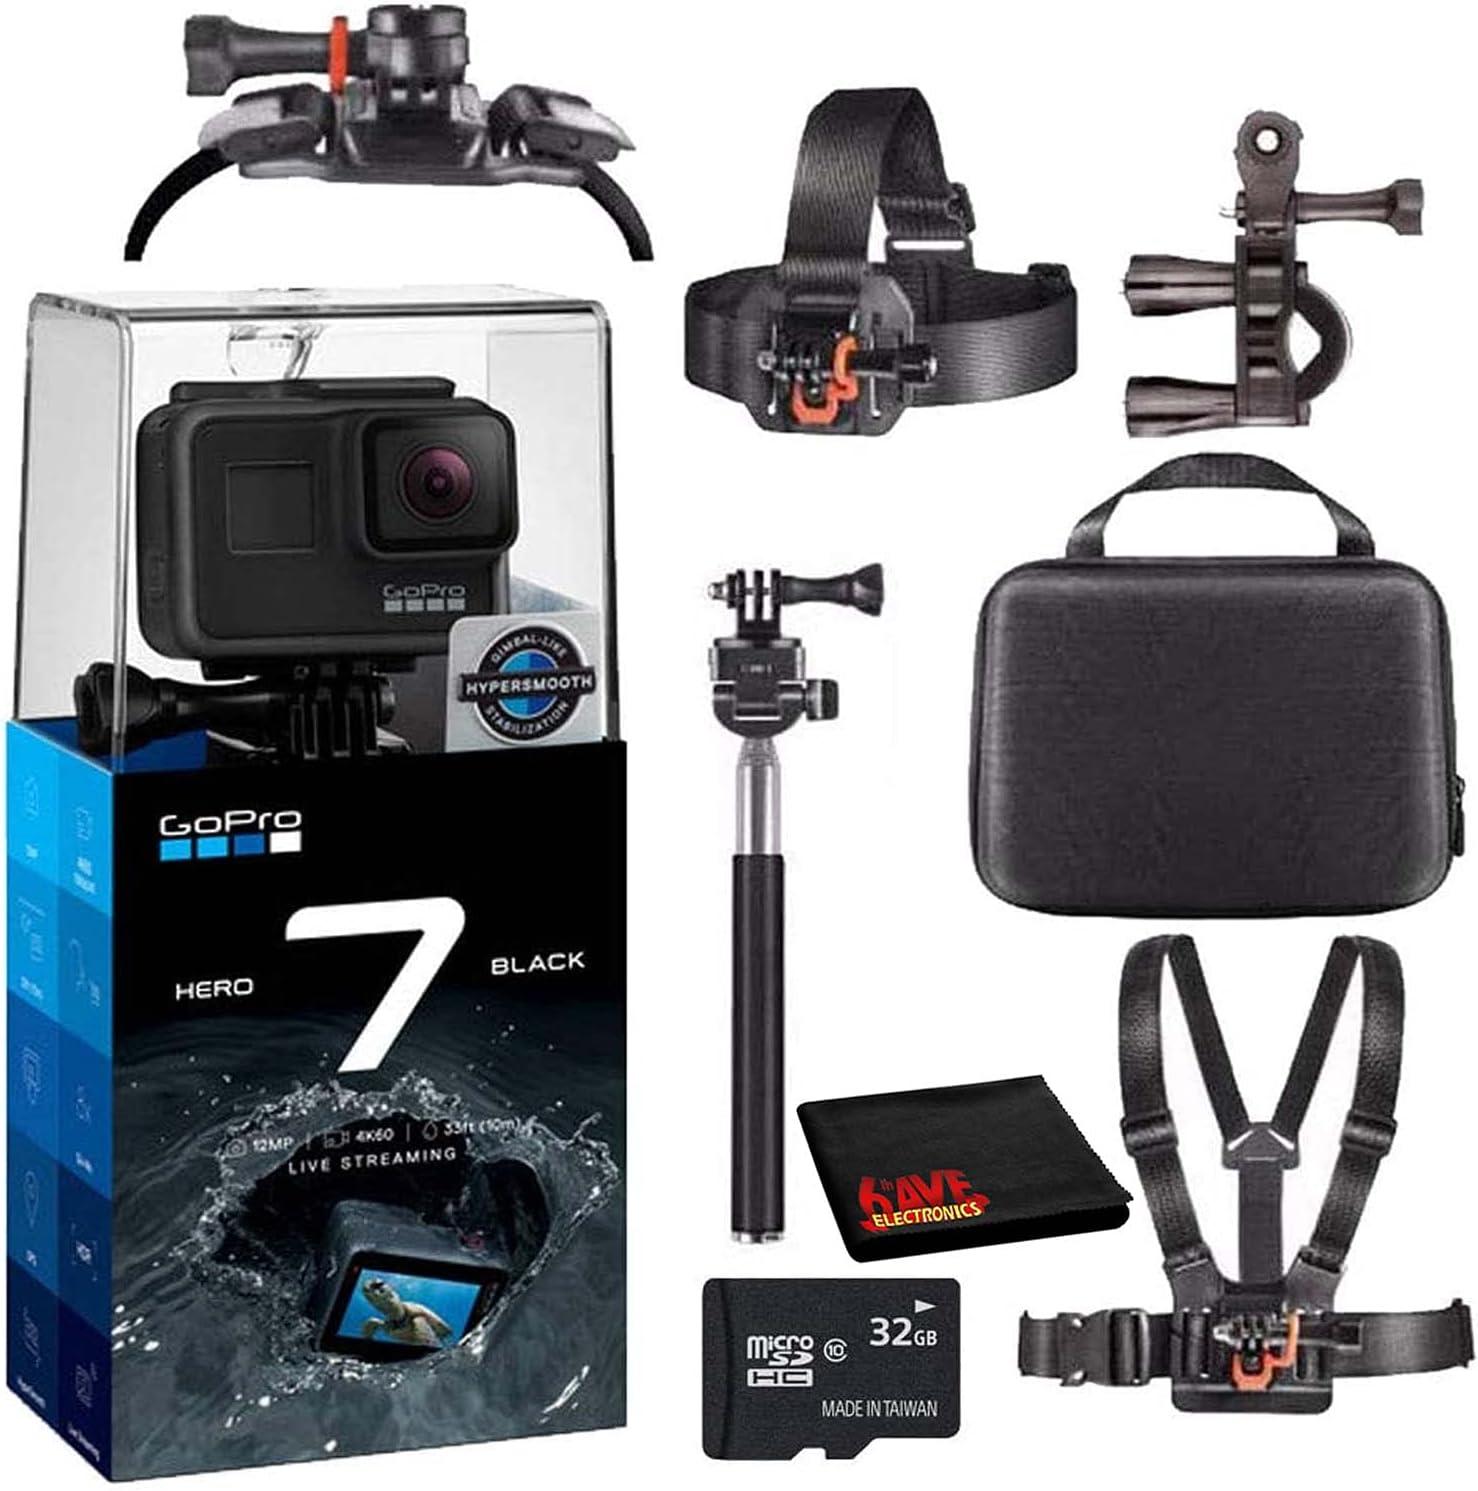 GoPro HERO7 Ranking TOP1 Hero 7 Waterproof Digital mi Camera Action 32GB Very popular with